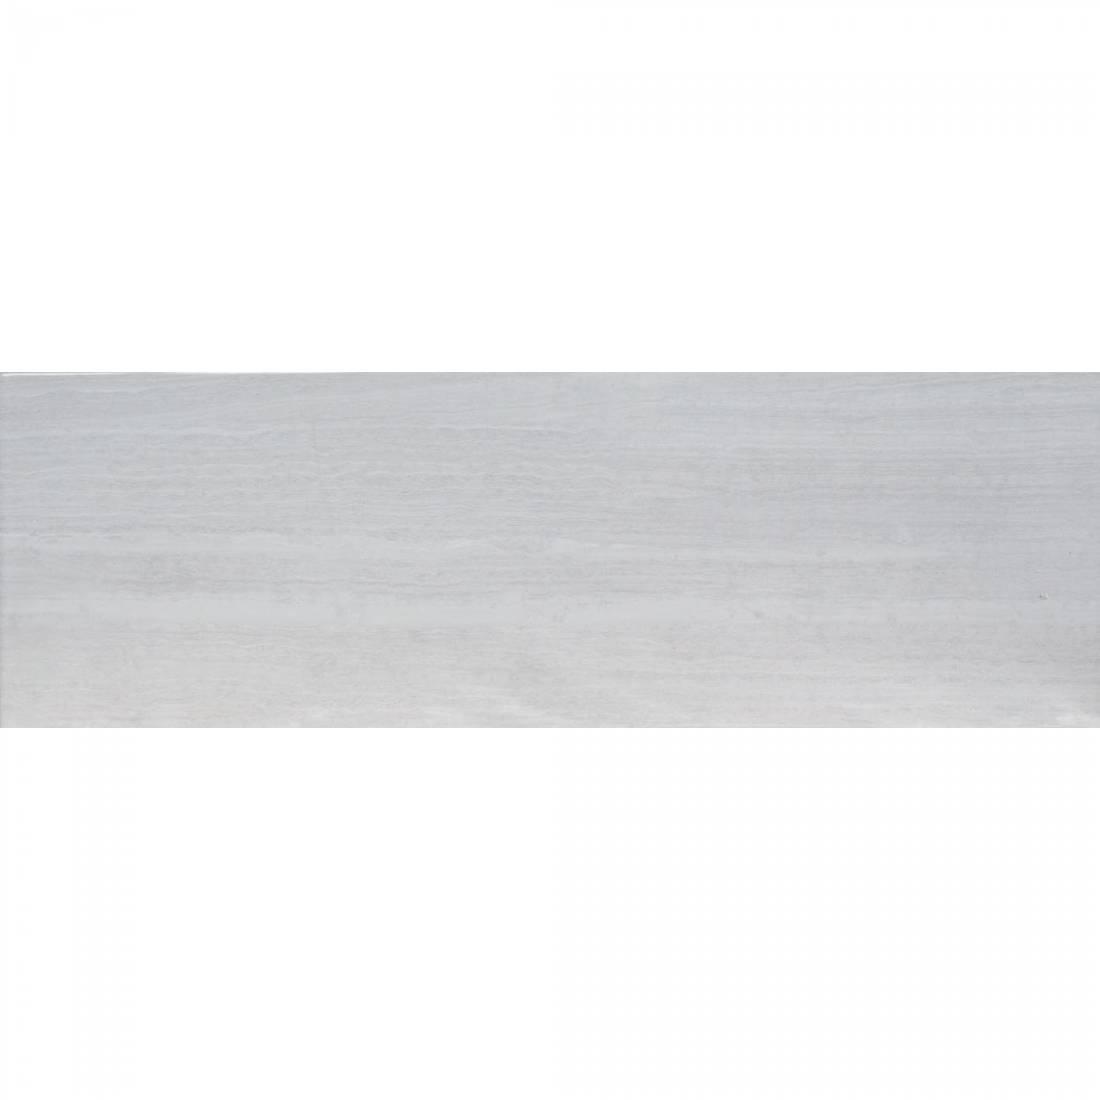 Senso 20x60 Light Grey Gloss 1